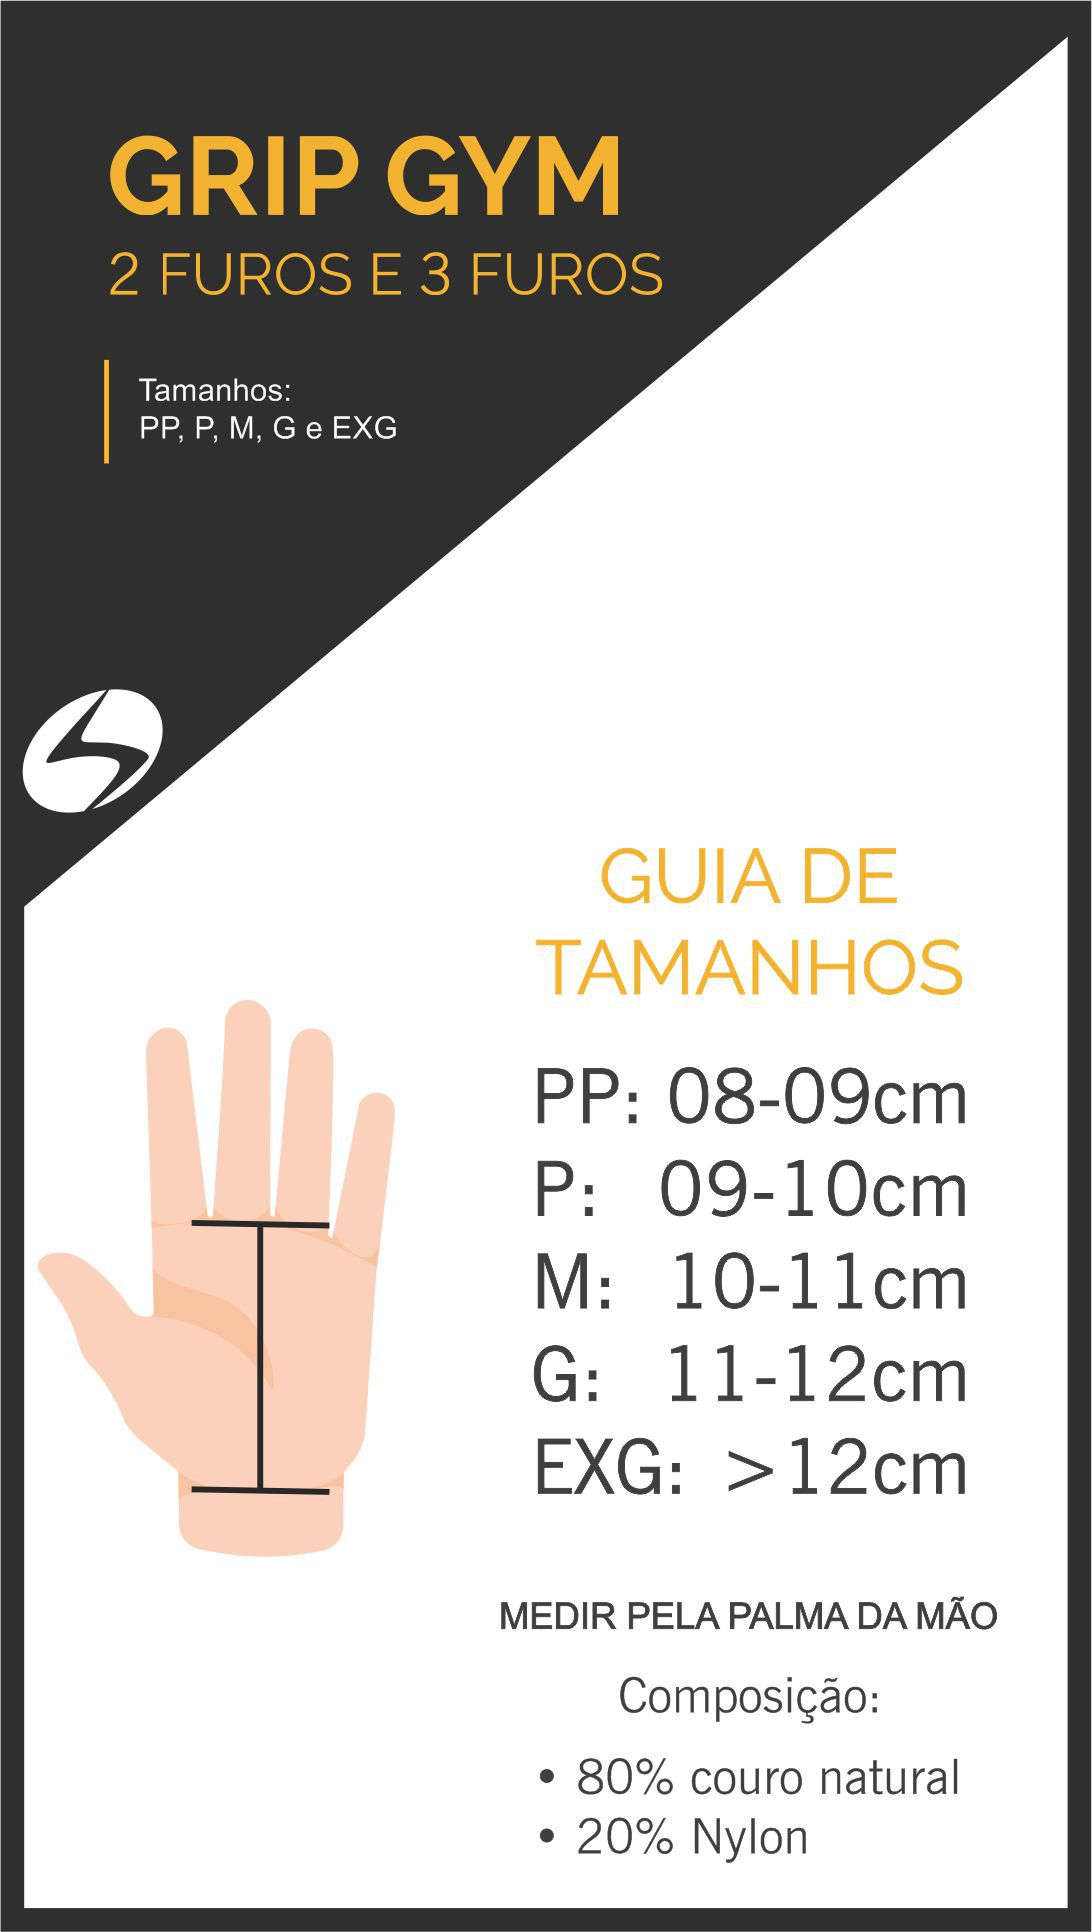 Grip Gym Basic 3.0 - Hand Grip - Crossfit - Café